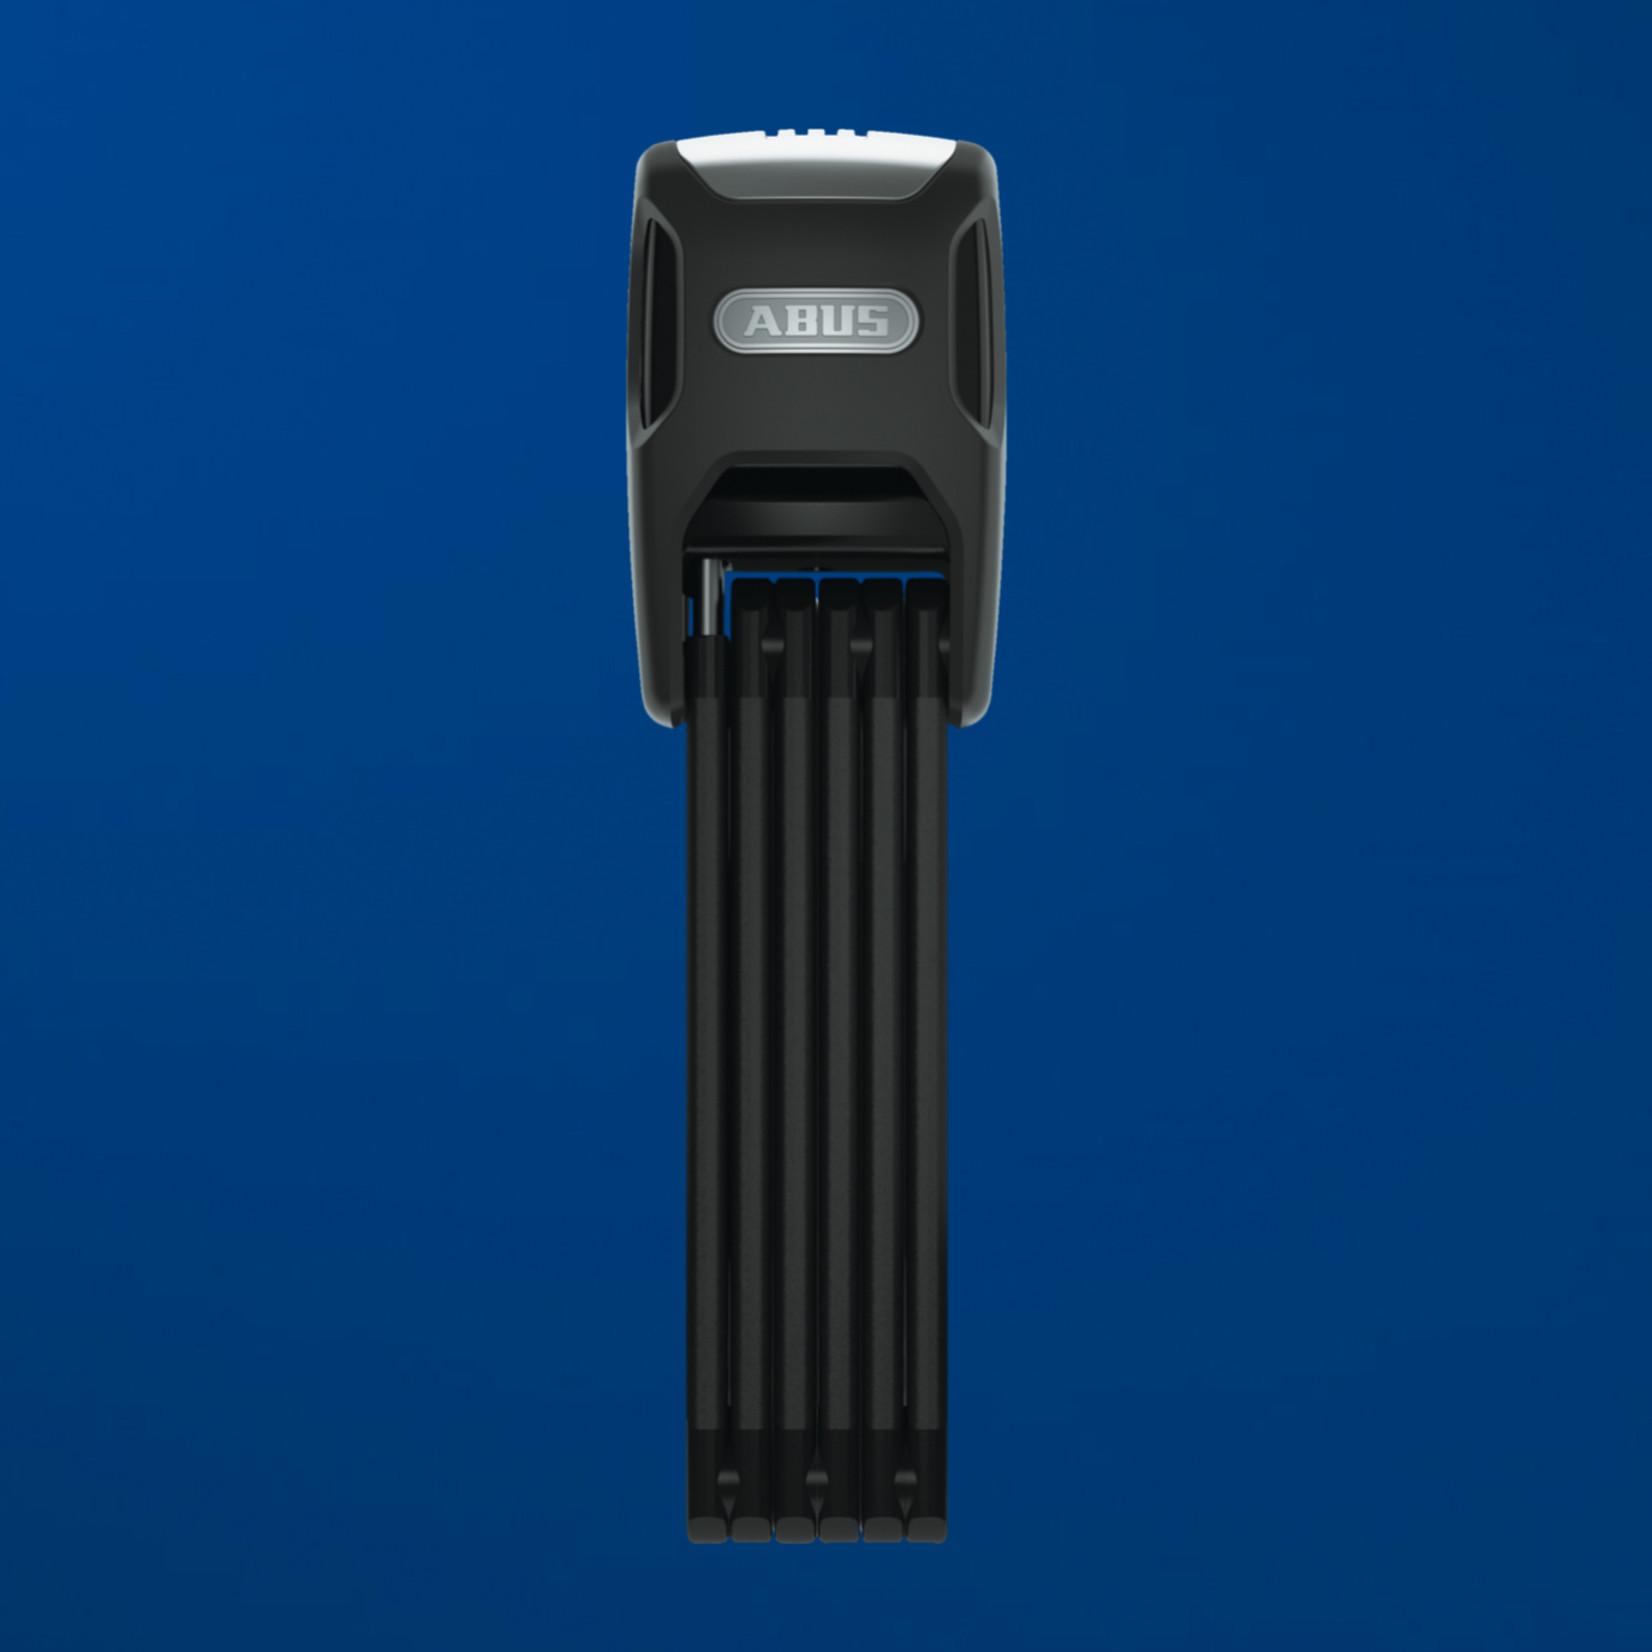 Abus Bordo 6000 Alarm, 90cm, Key